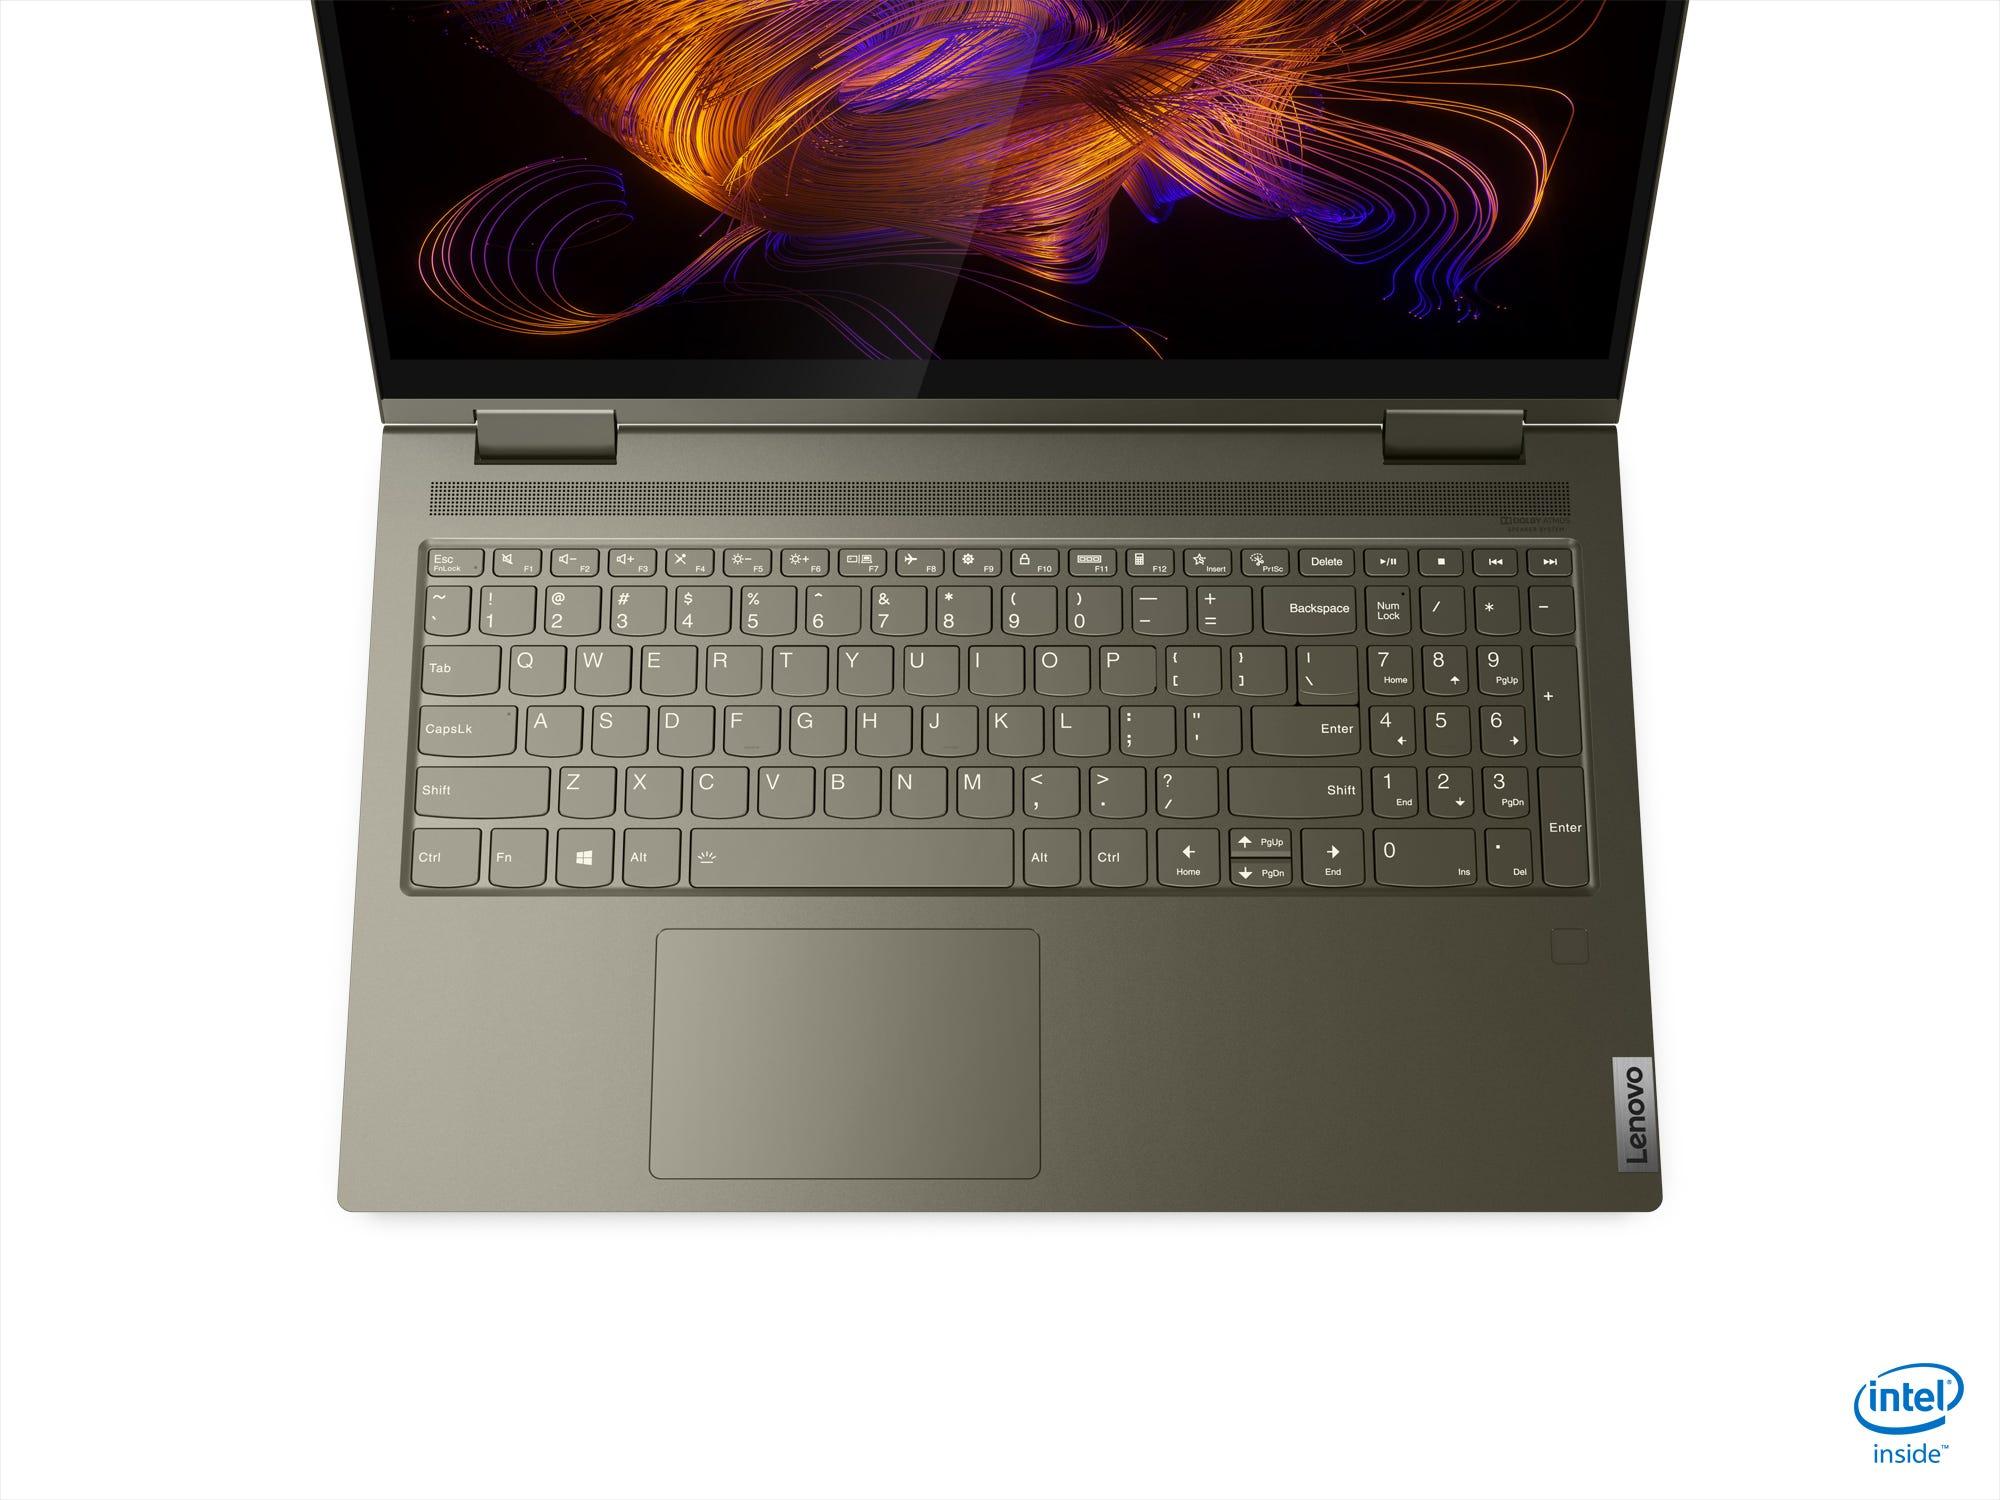 Lenovo Yoga 7i keyboard